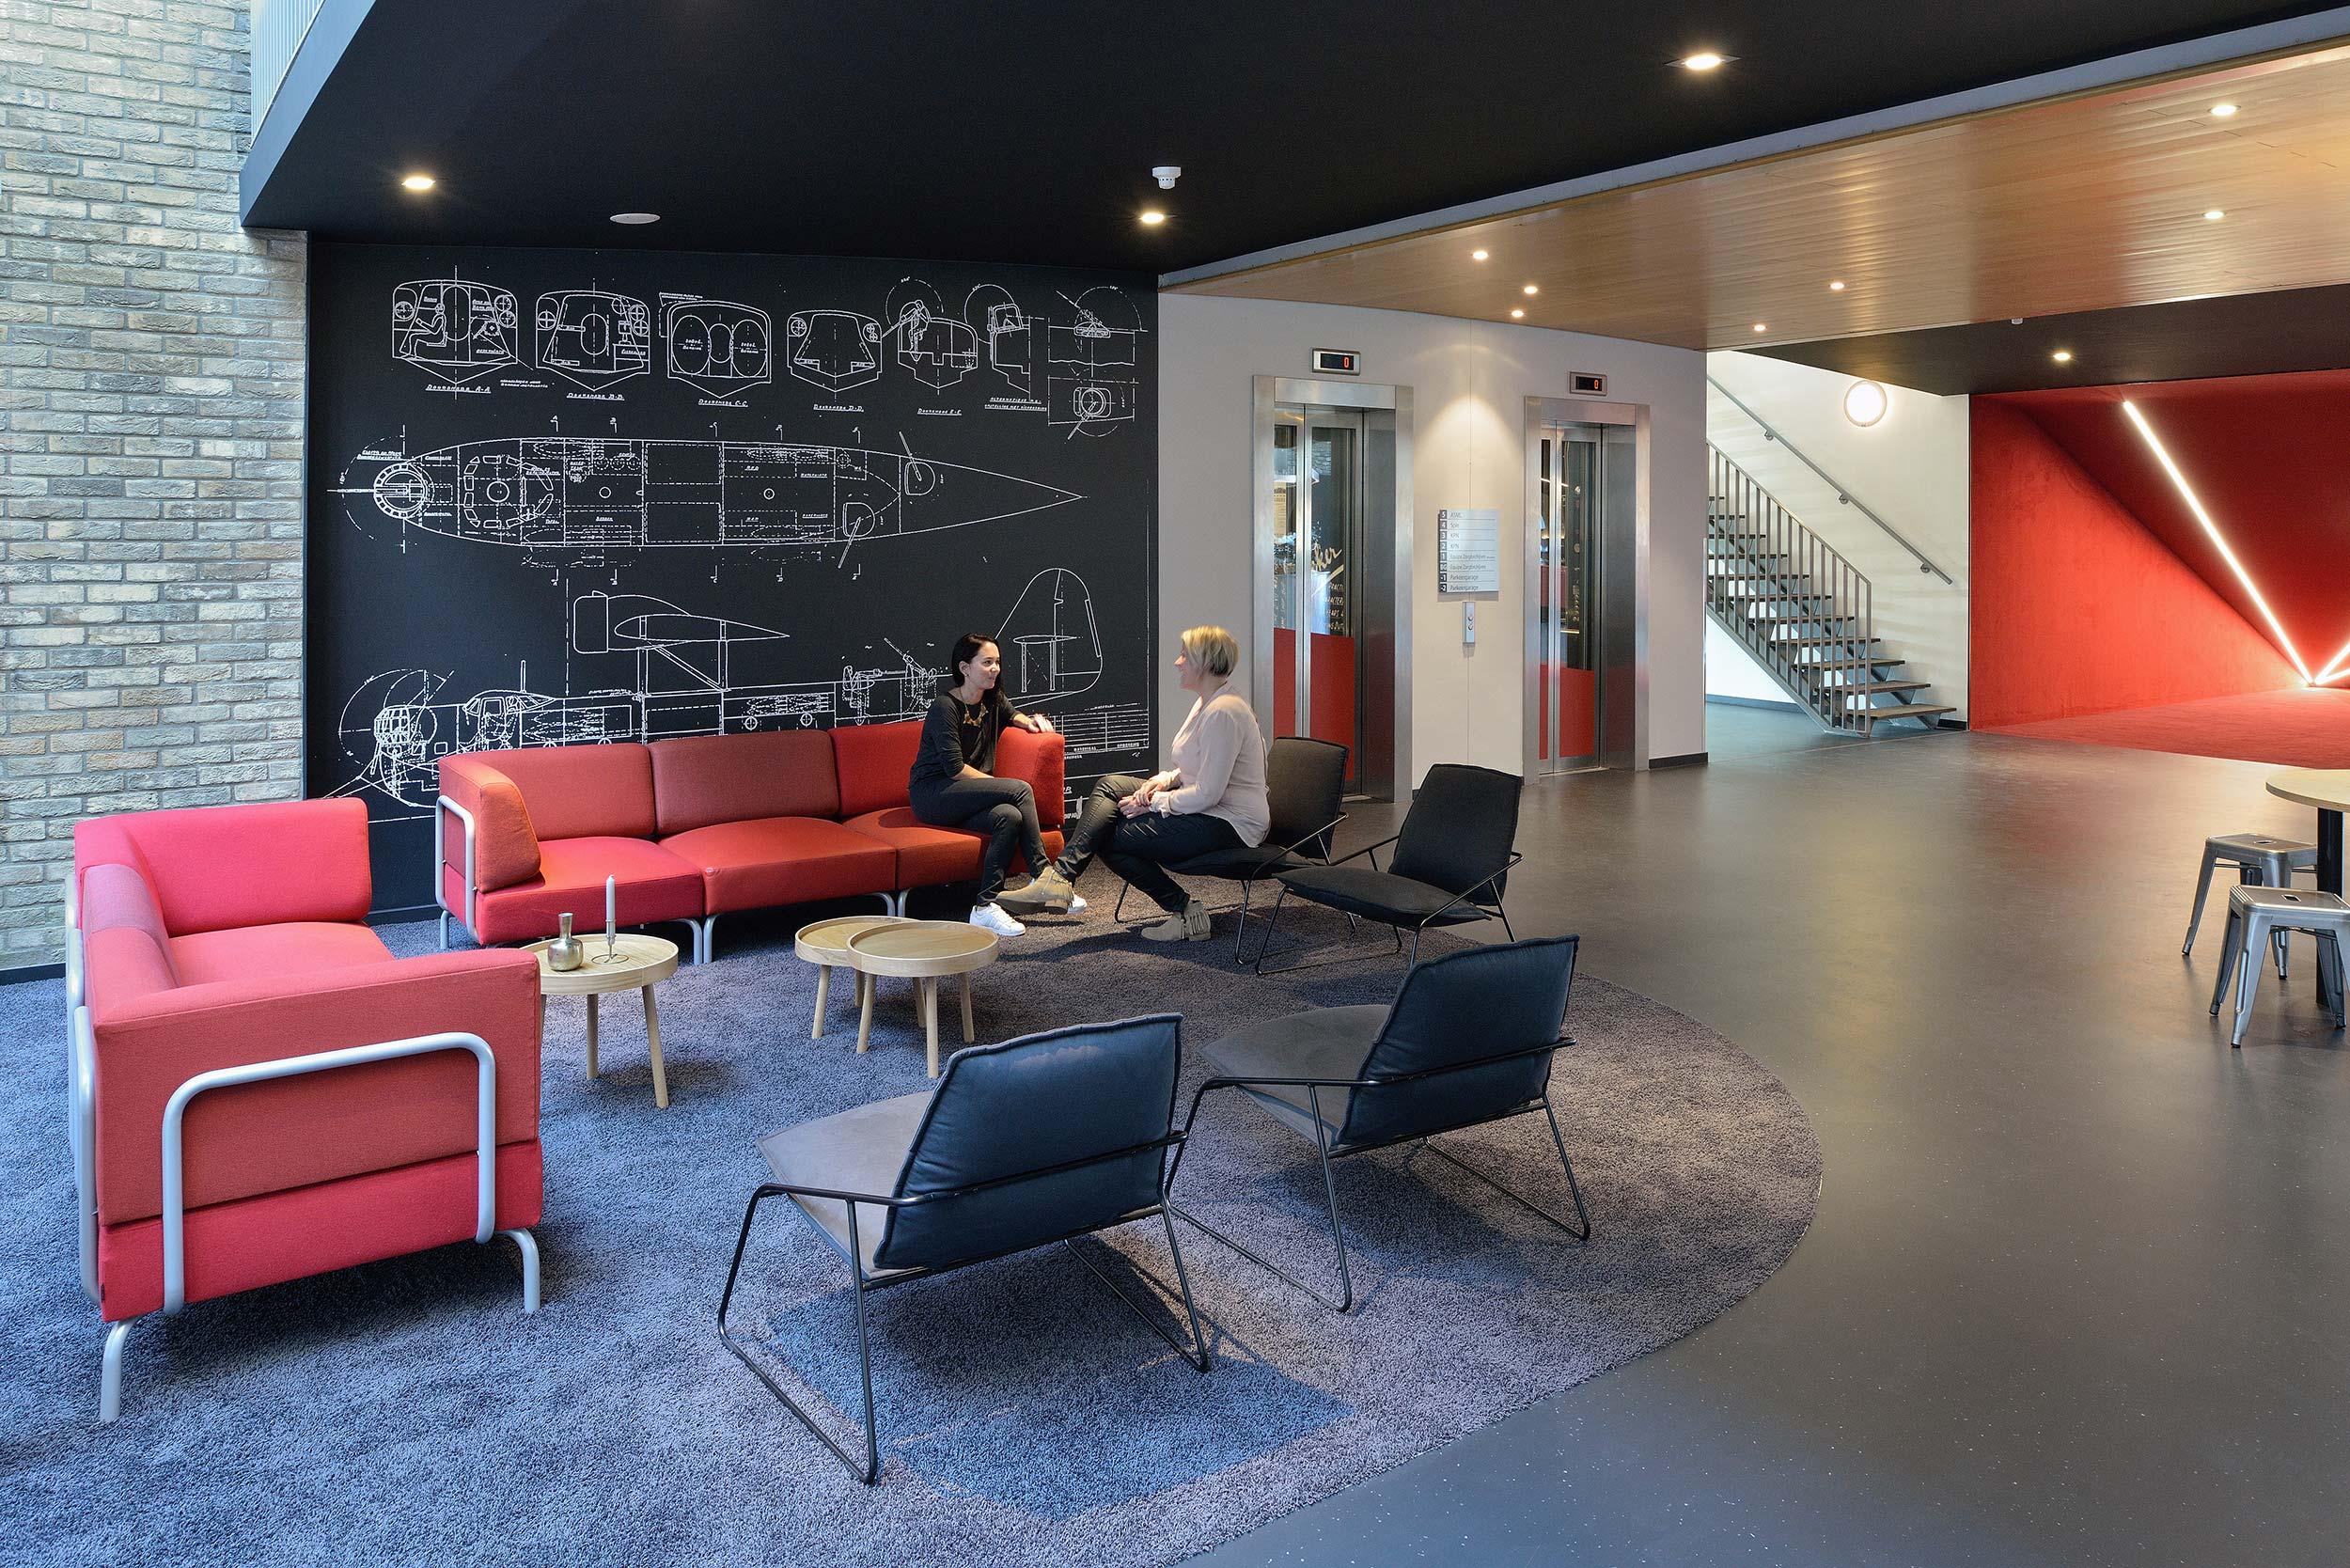 Luchtruim Eindhoven, kantoorgebouw - fotograaf Chiel de Nooyer, interieurfotografie